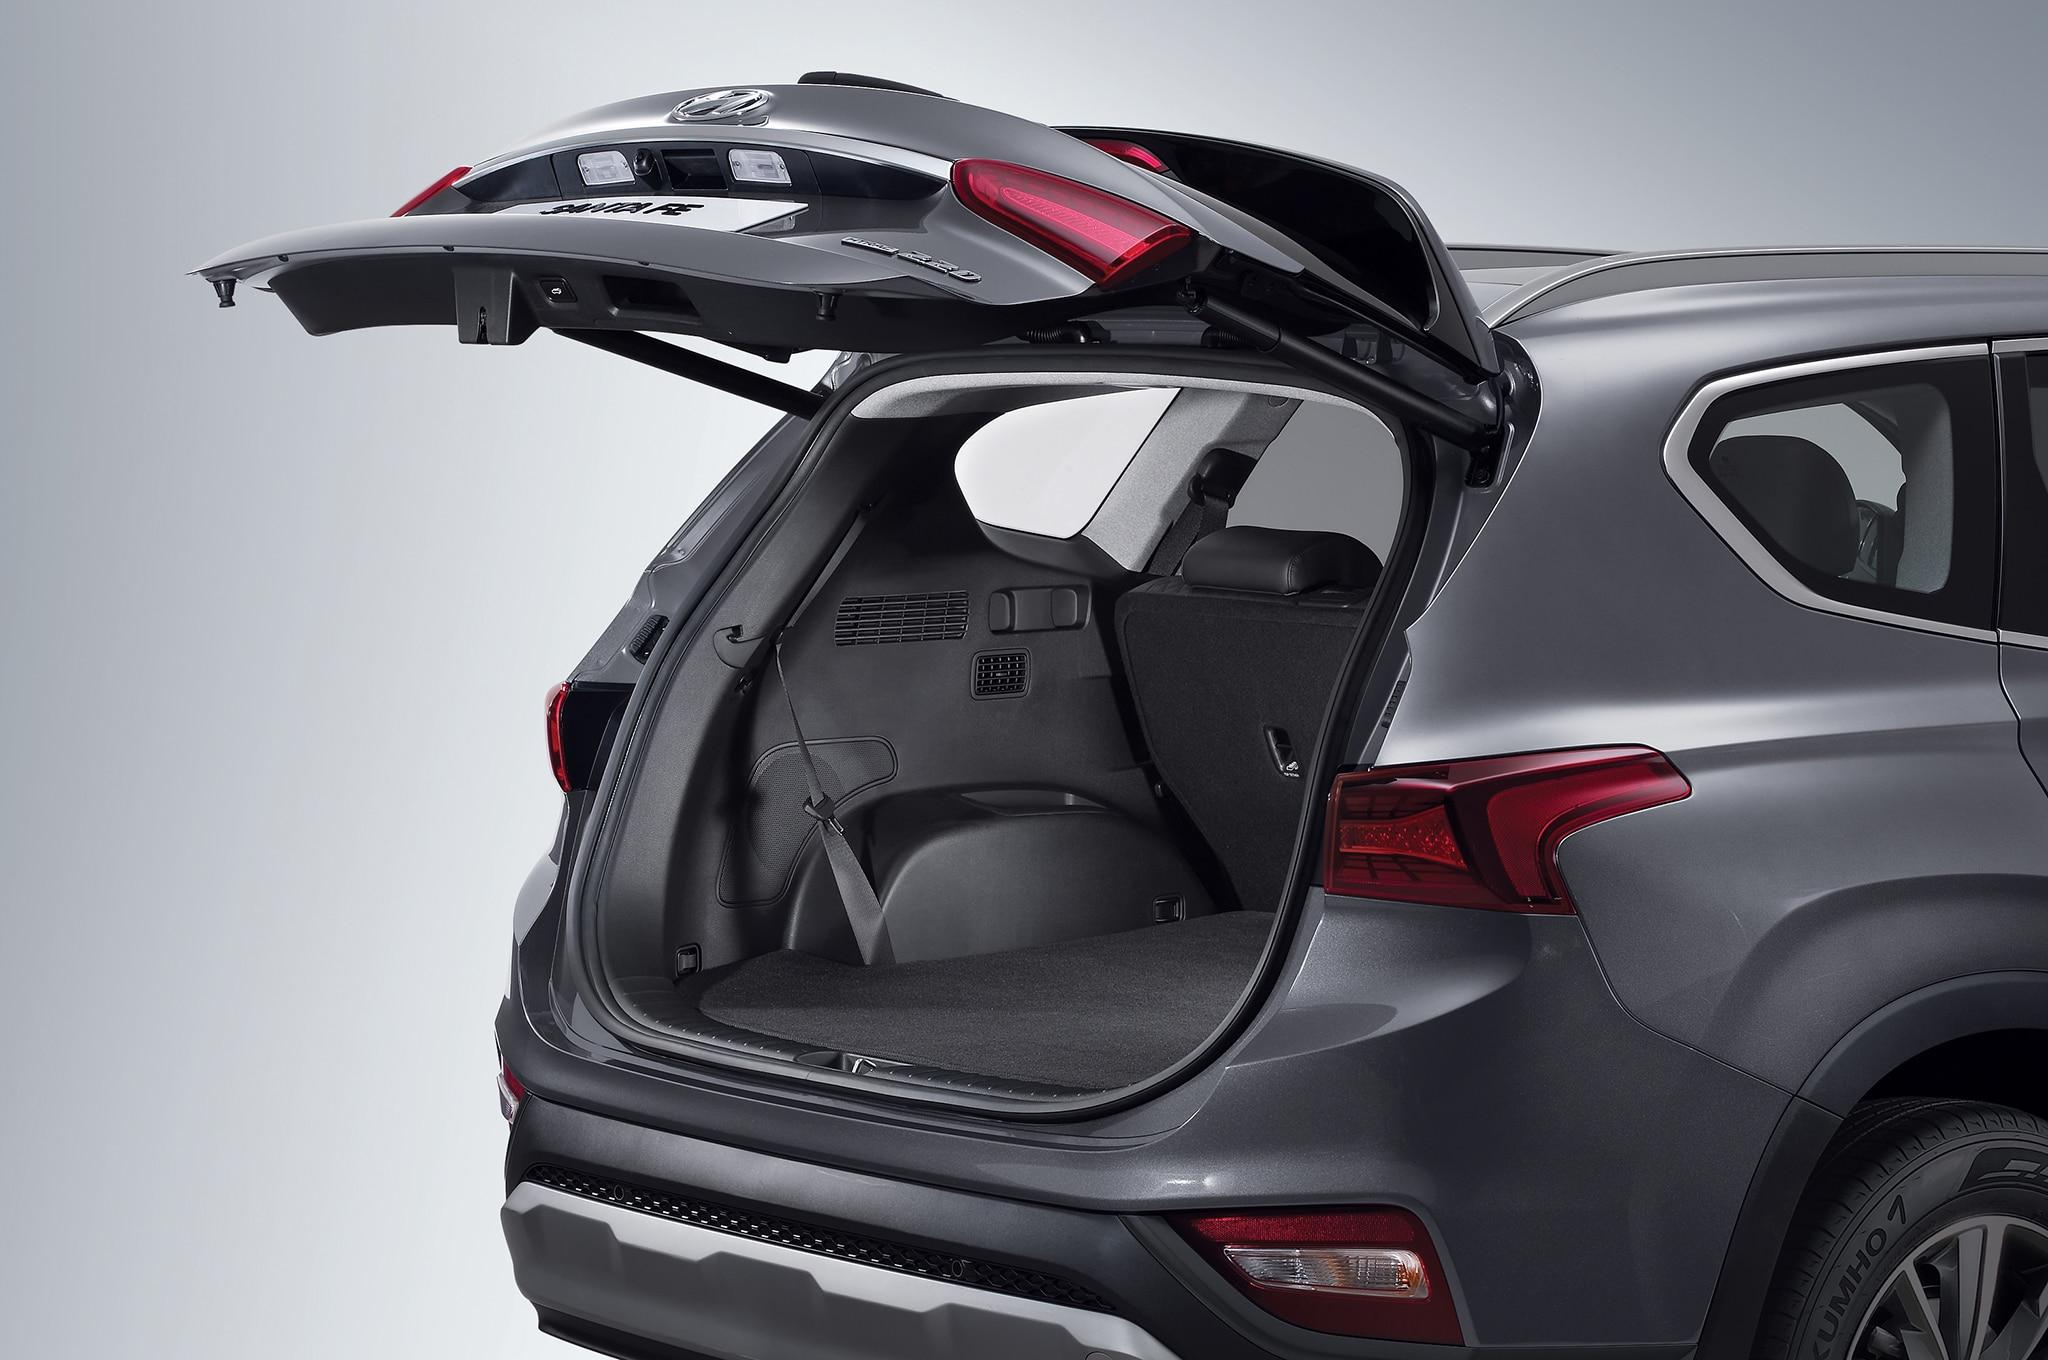 3rd Row Suv >> 2019 Hyundai Santa Fe First Drive Review | Automobile Magazine